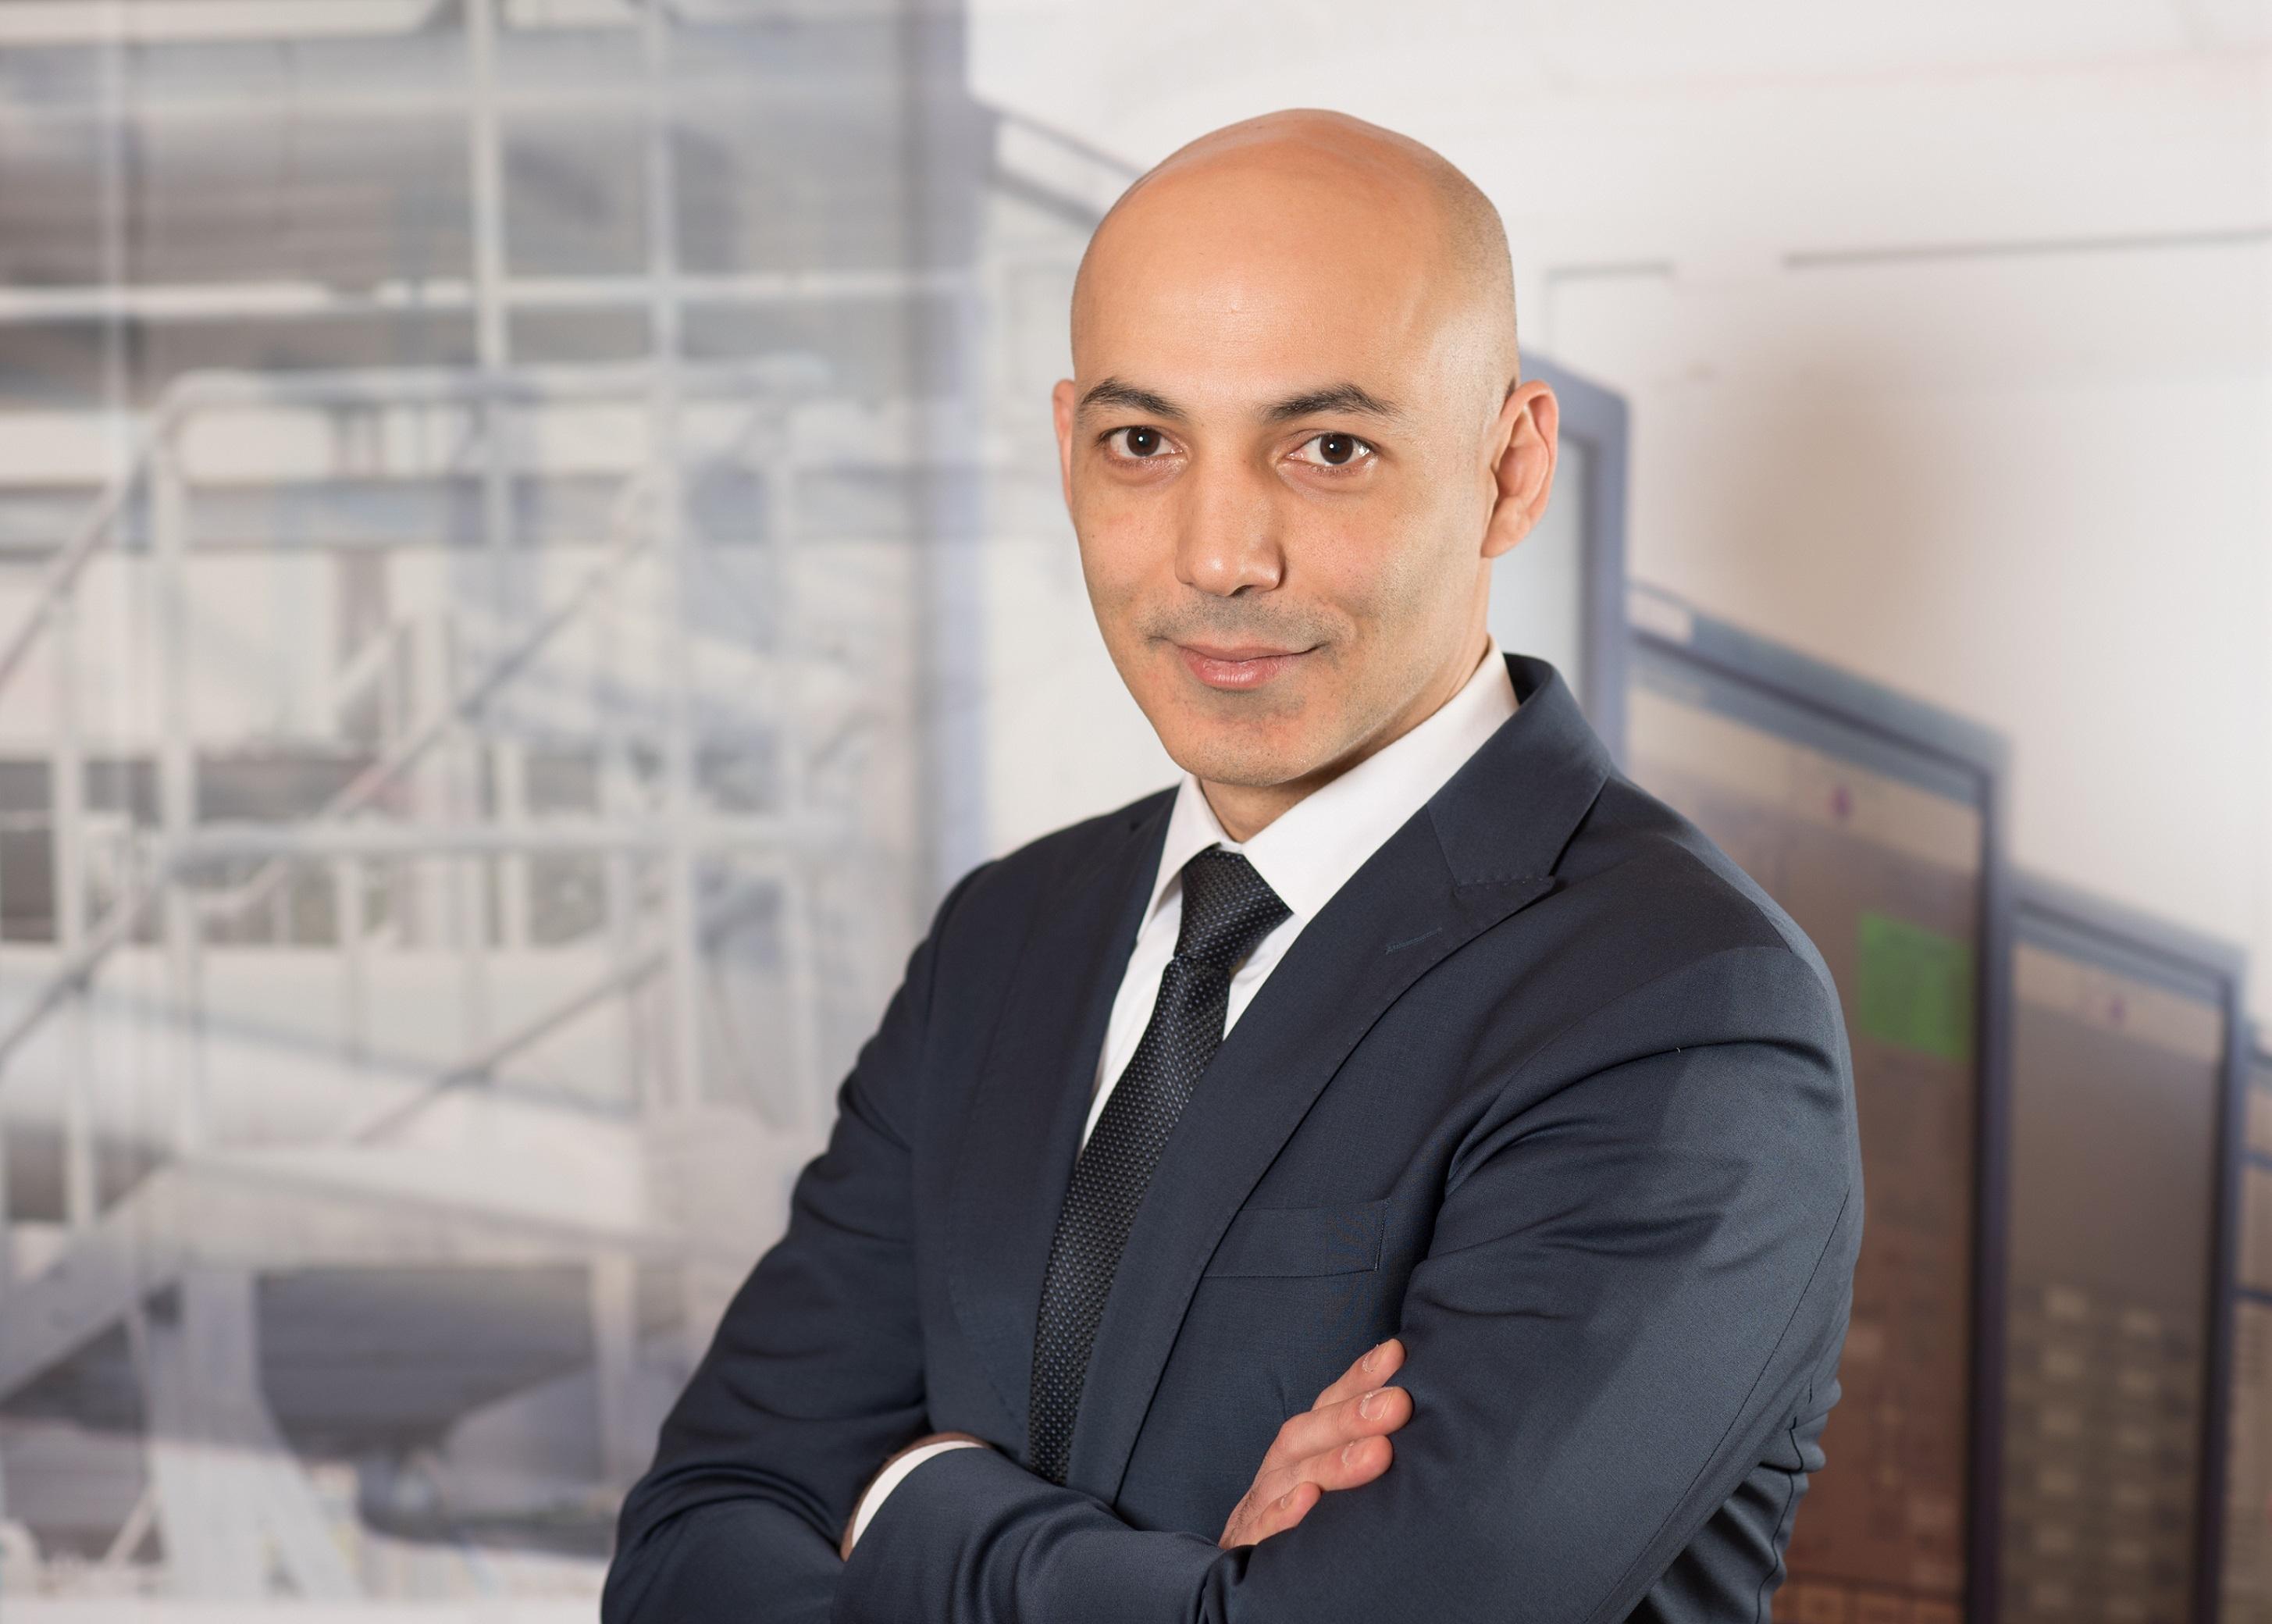 KUNA : KIPIC to expand Al-Zour refinery with Honeywell tech